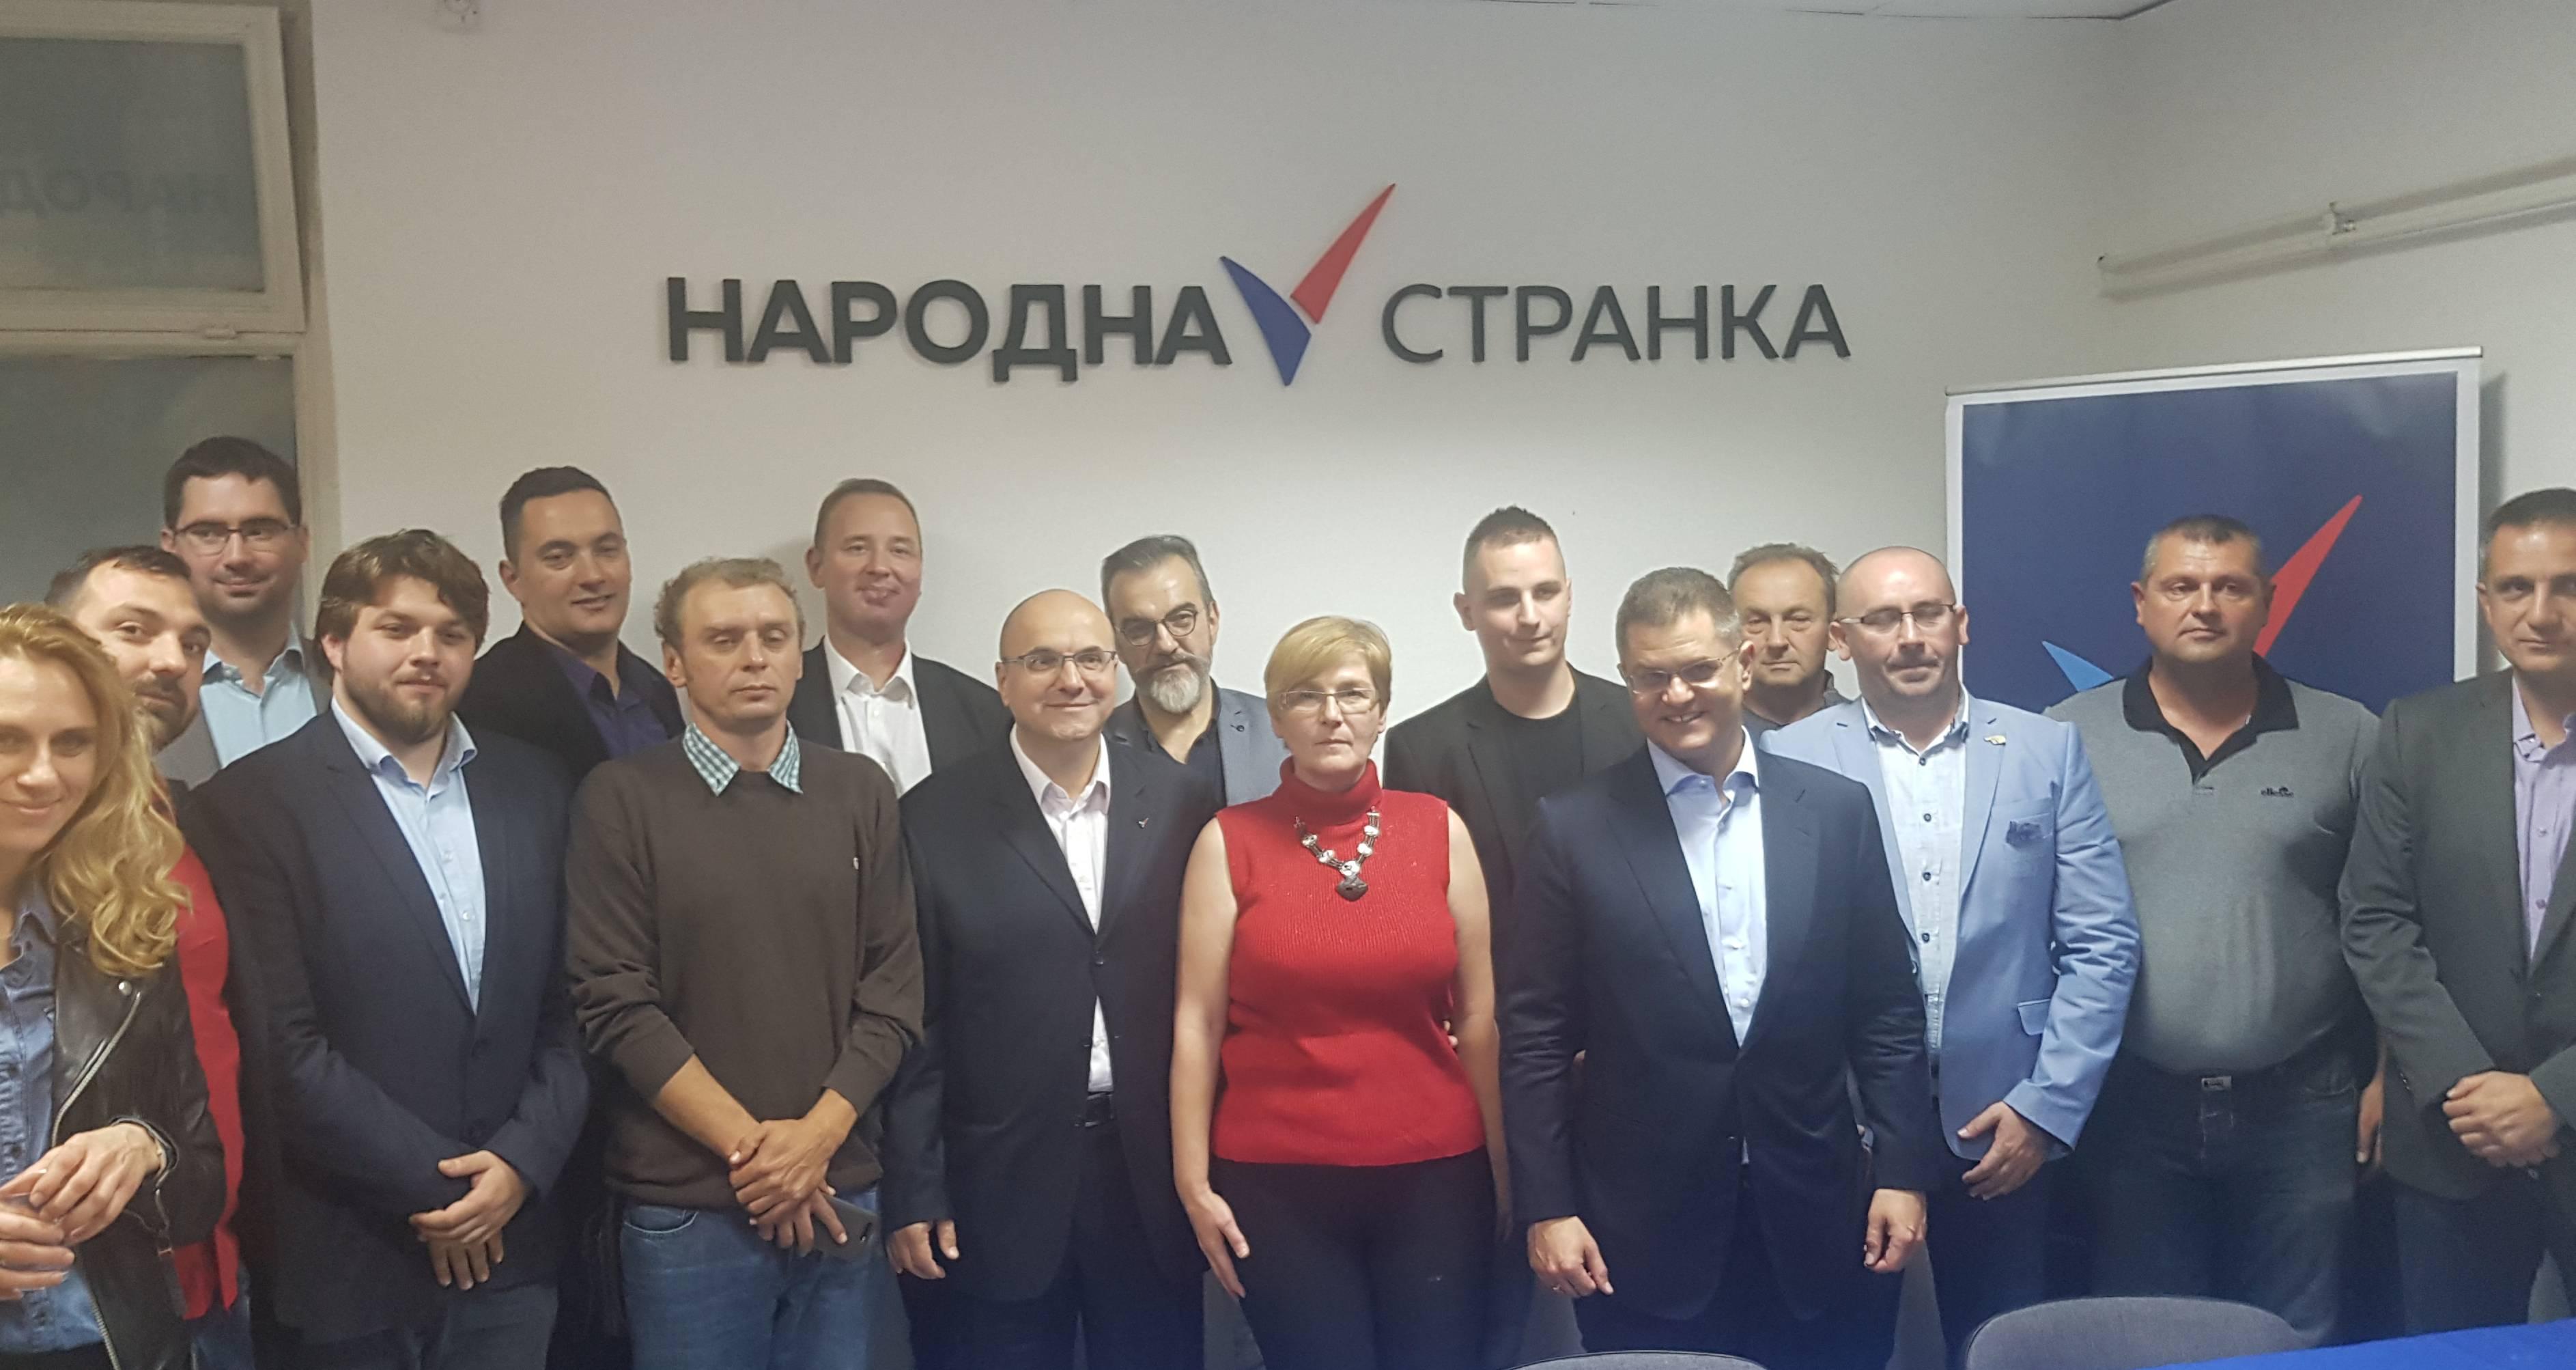 Врбас: Основан Градски одбор Народне странке